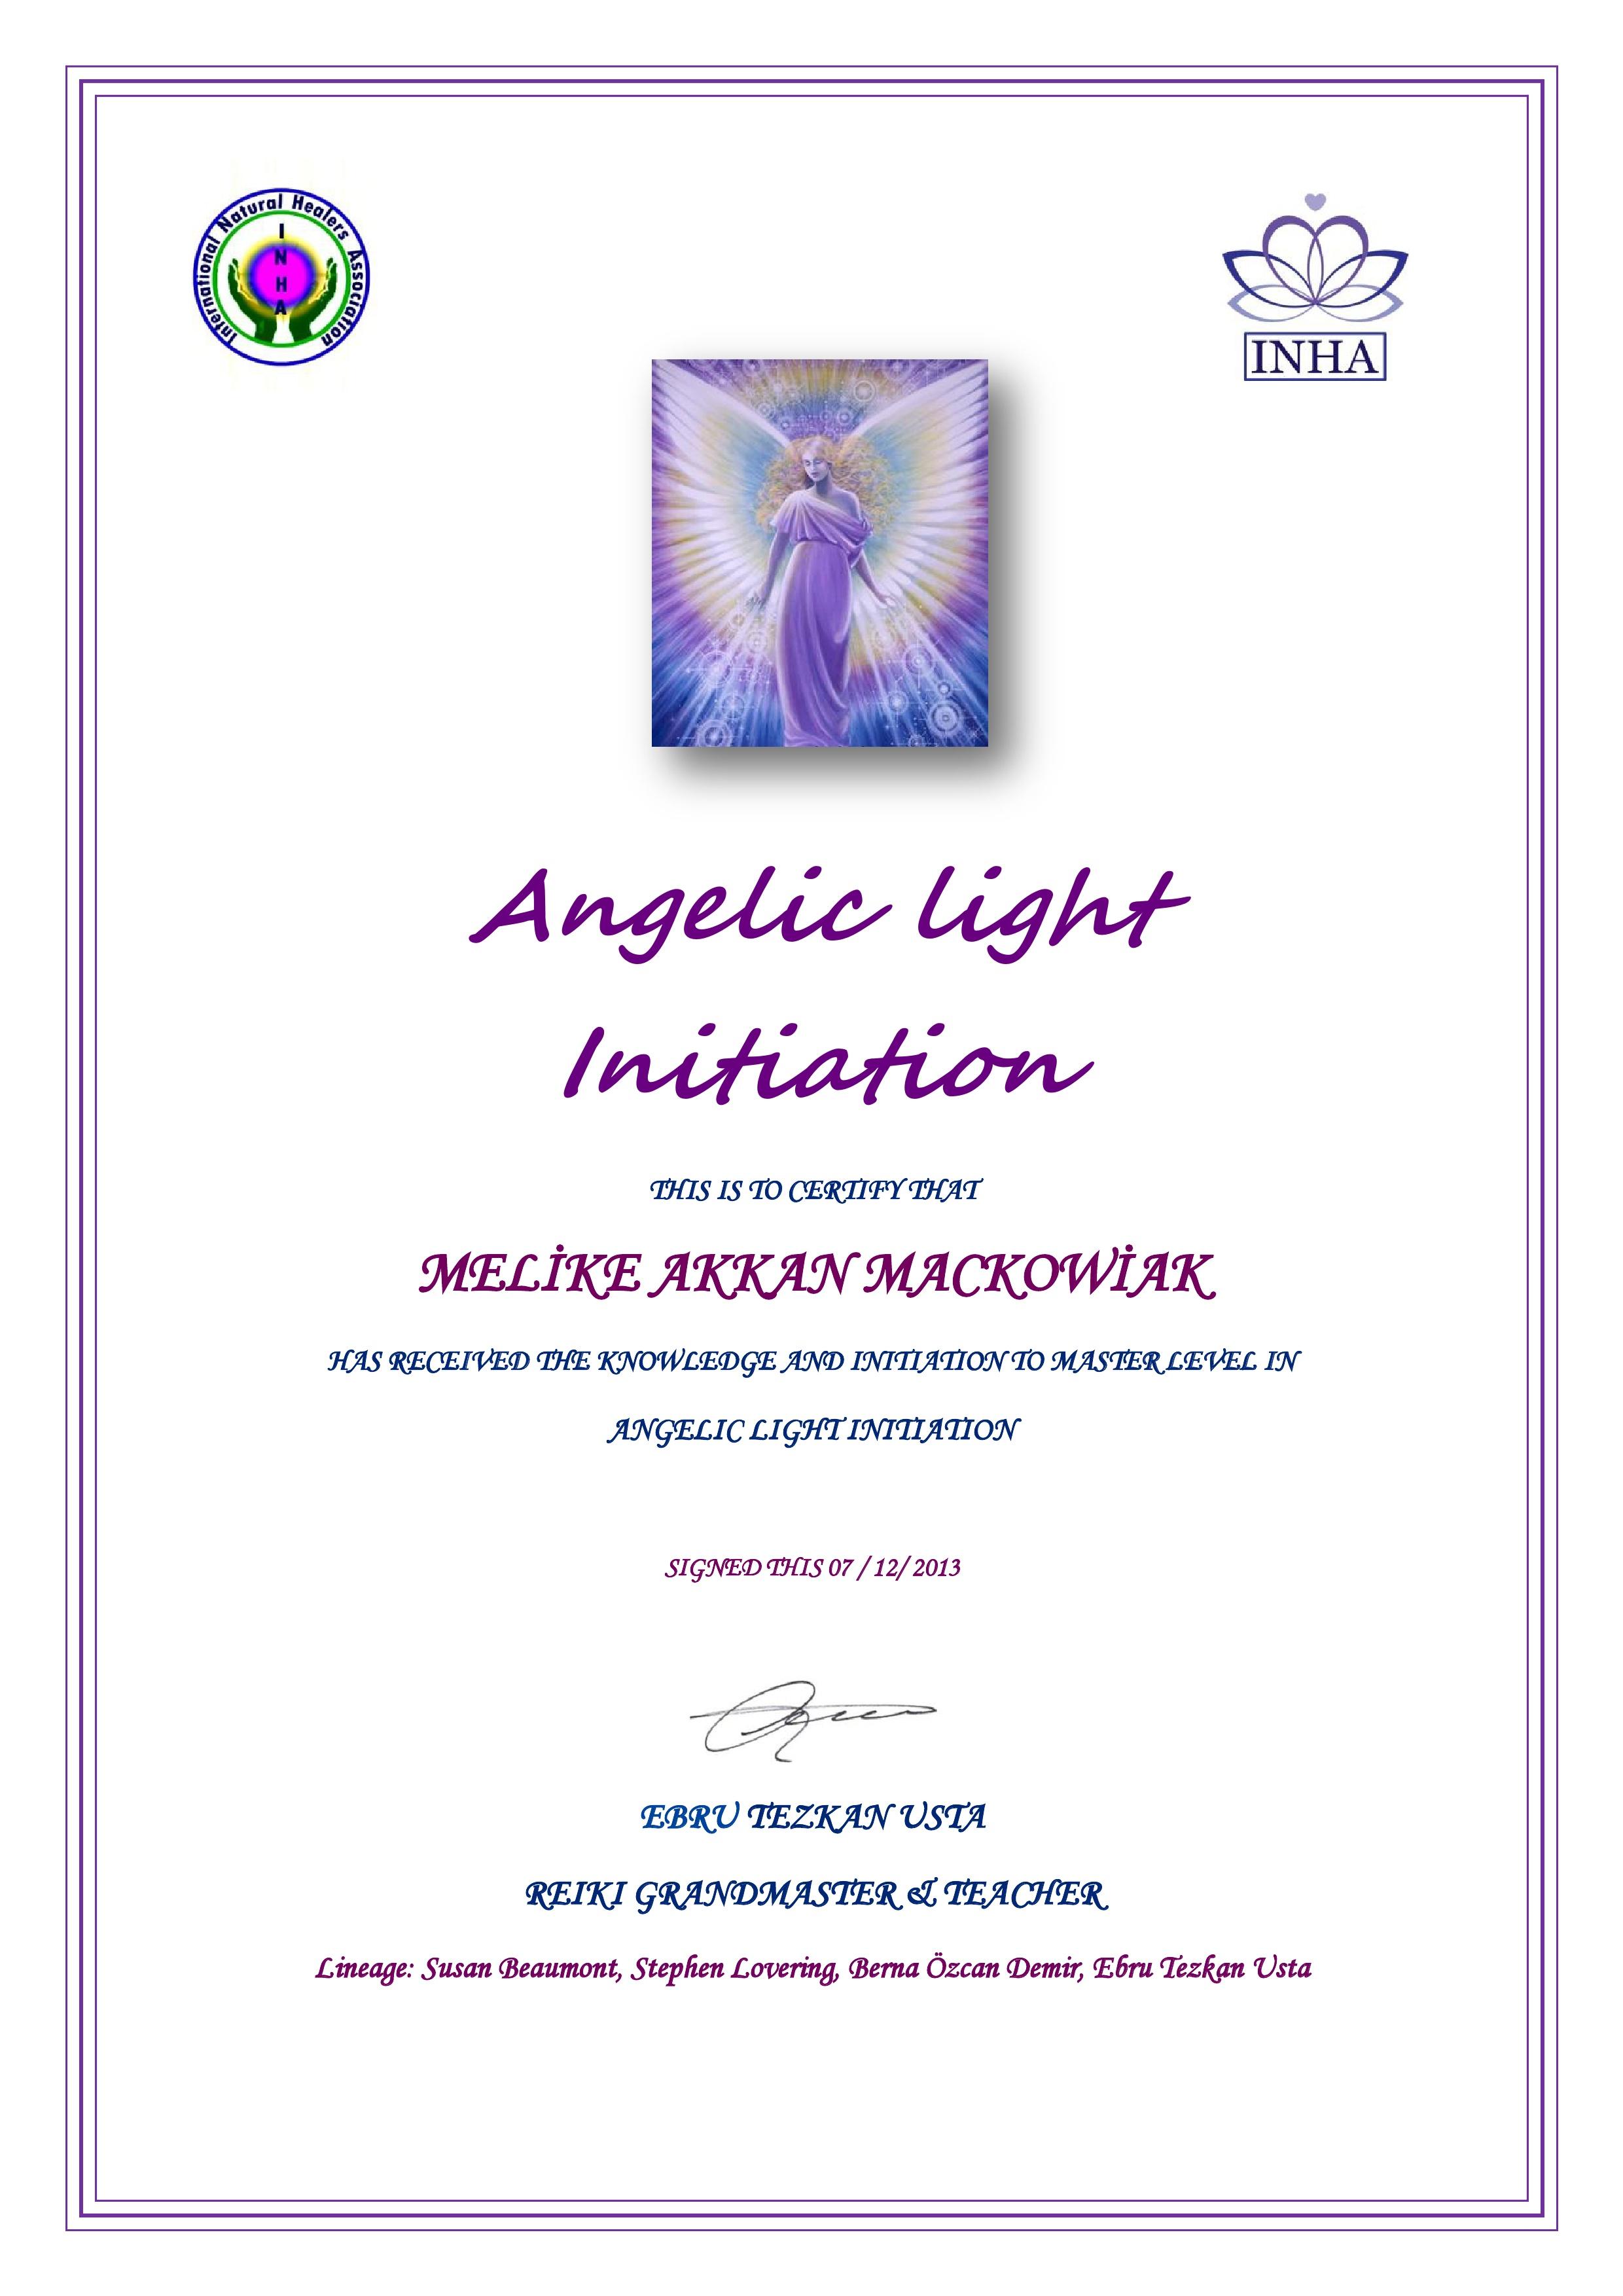 ANGEL LİGHT SERTİFİKA -1